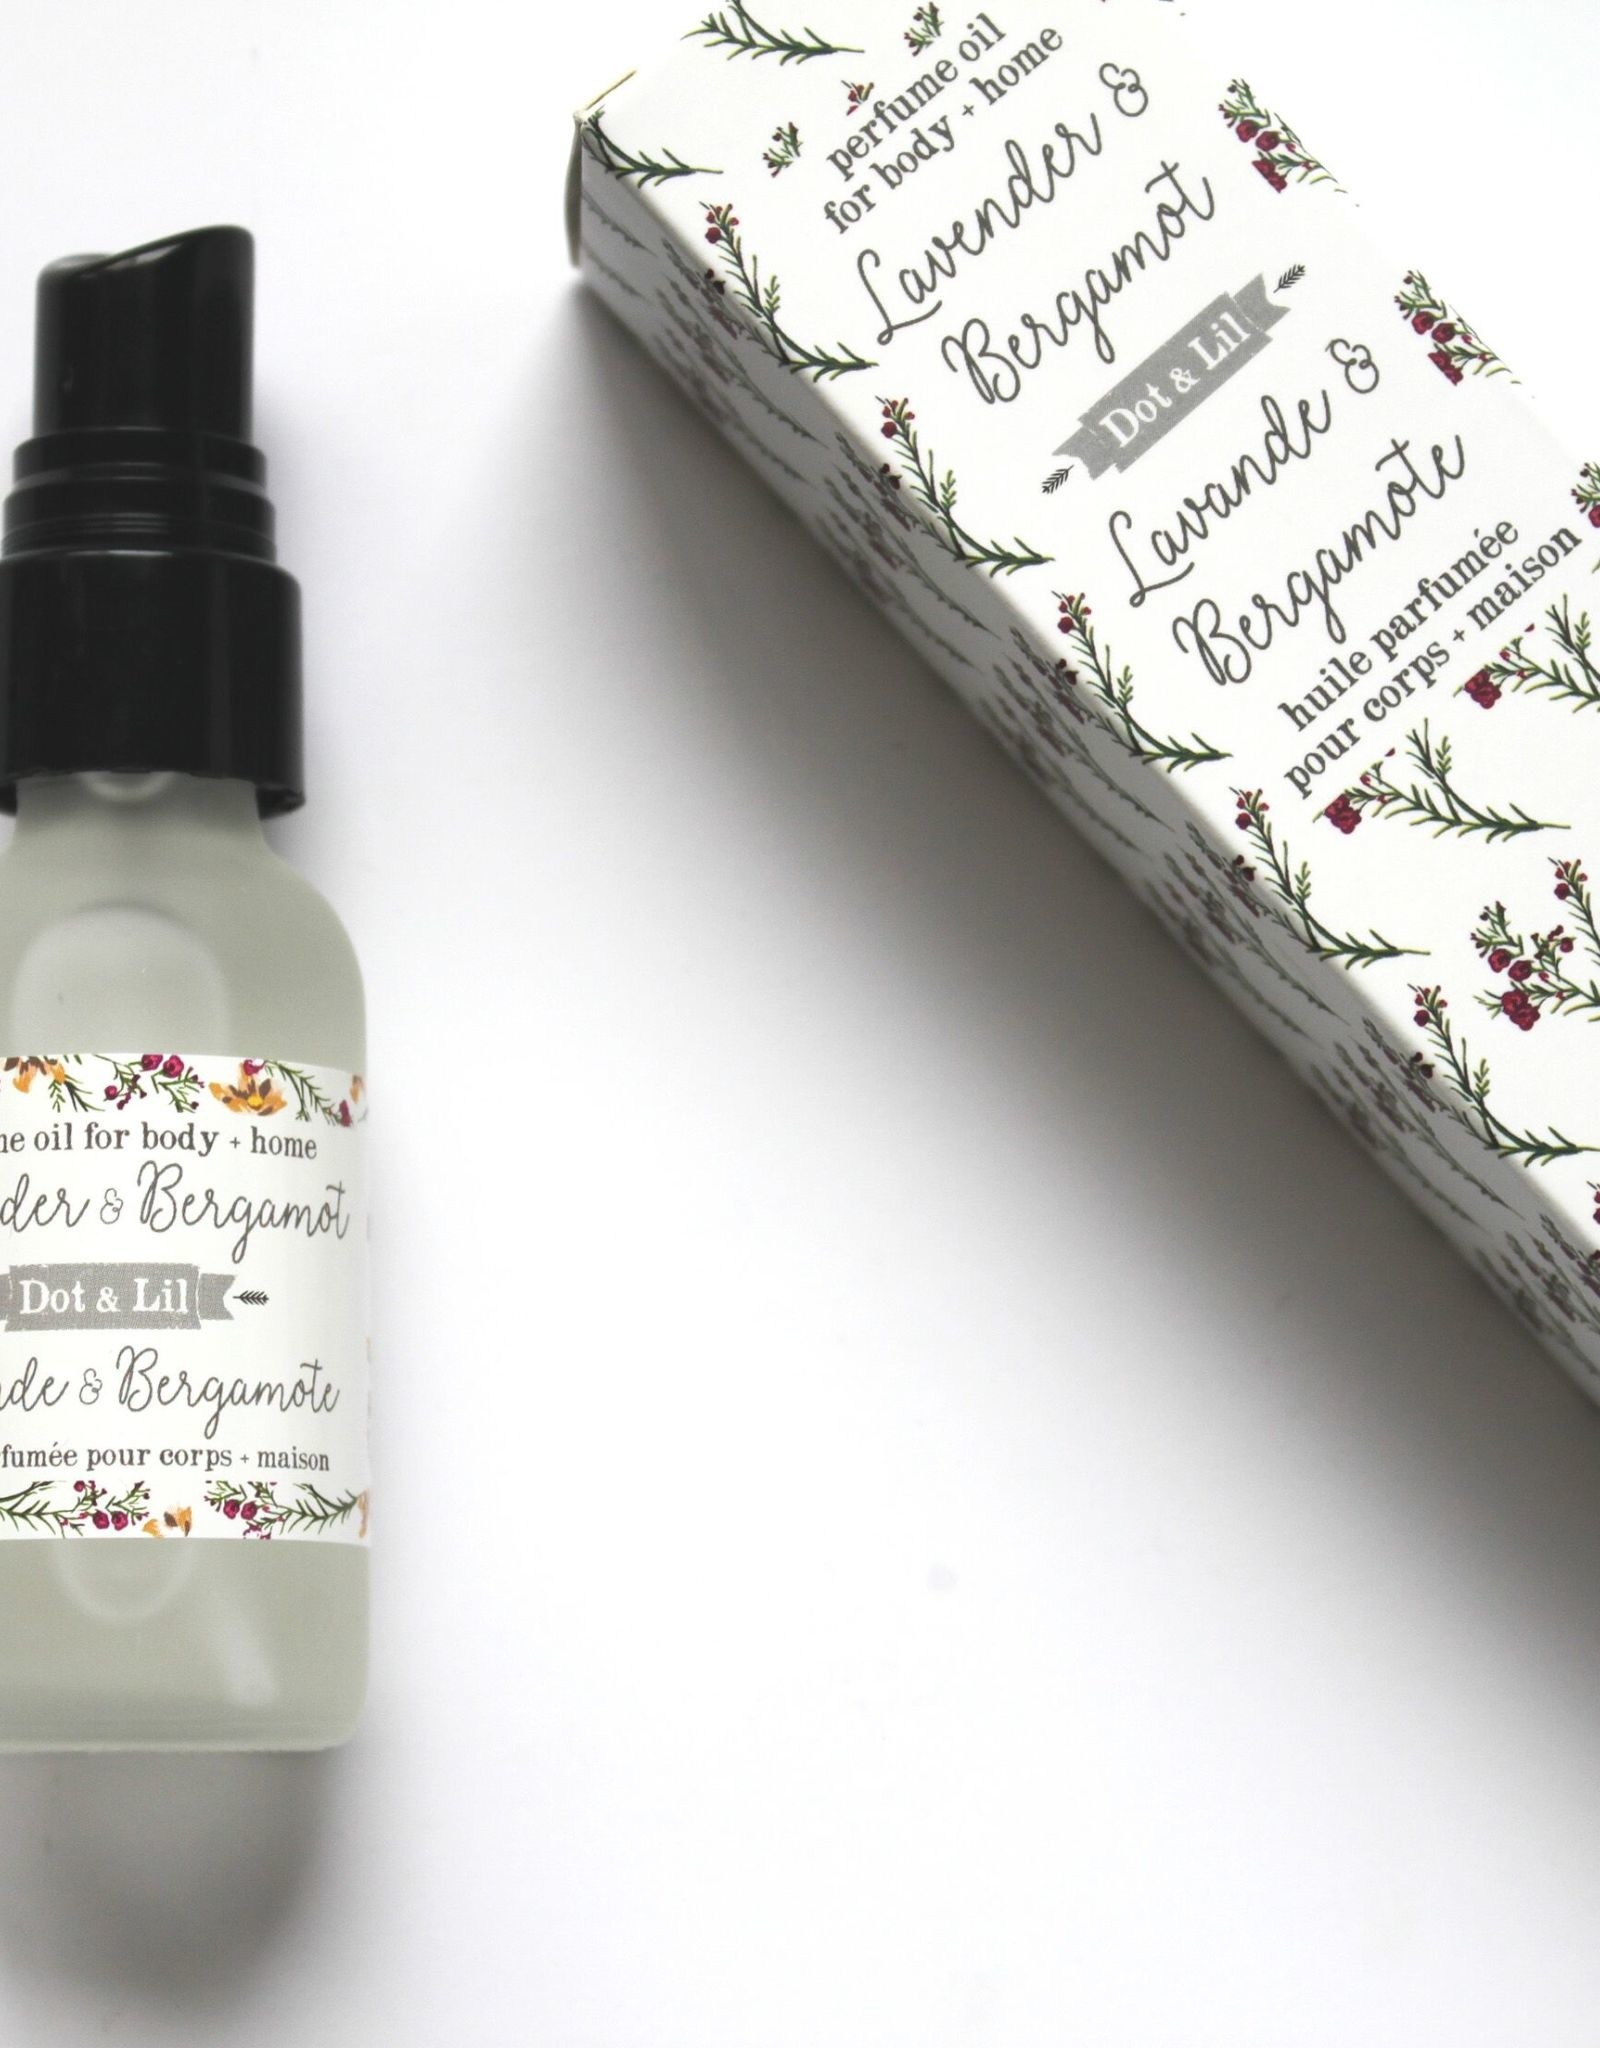 Dot & lil Huile parfumée Lavande & Bergamote